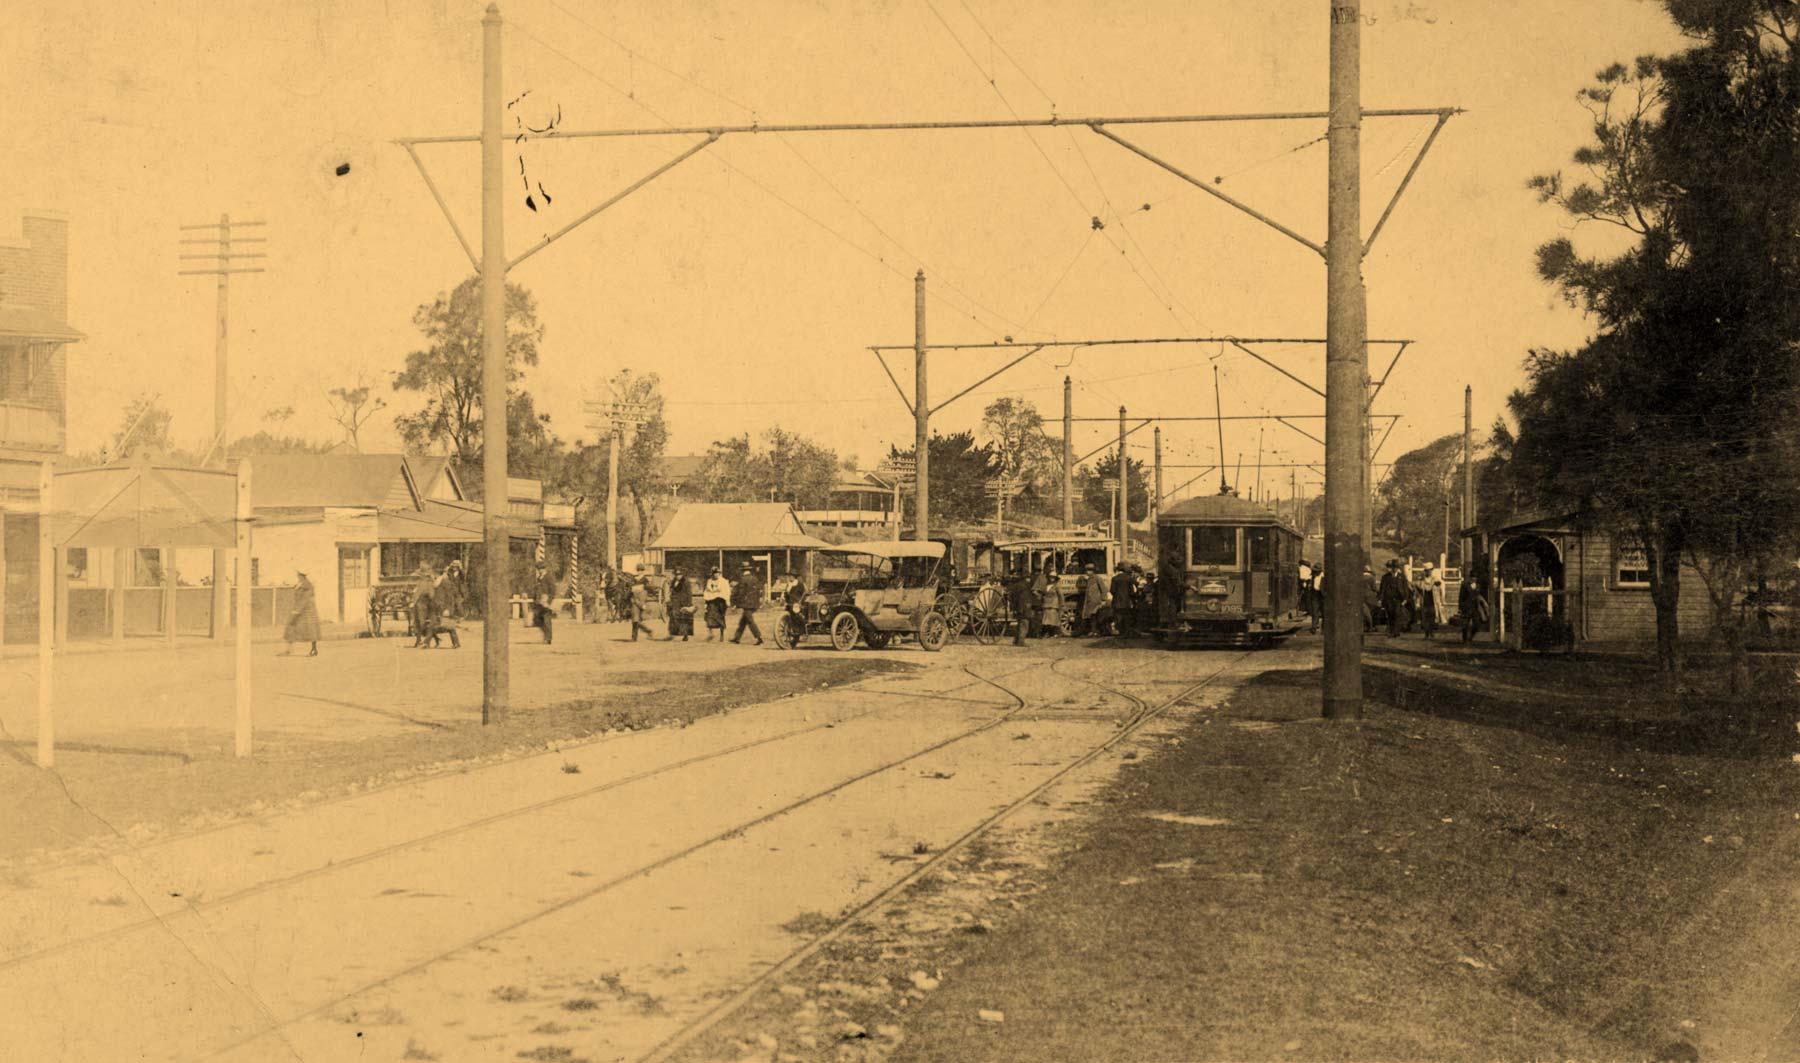 Tram to Narrabeen